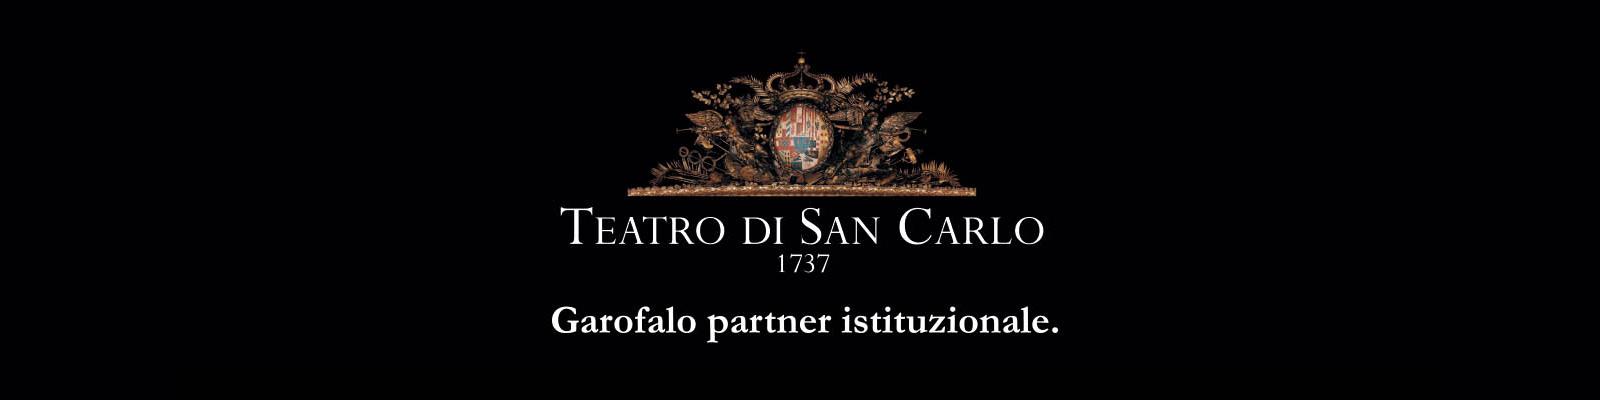 Pasta Garofalo sponsor di Teatro S. Carlo